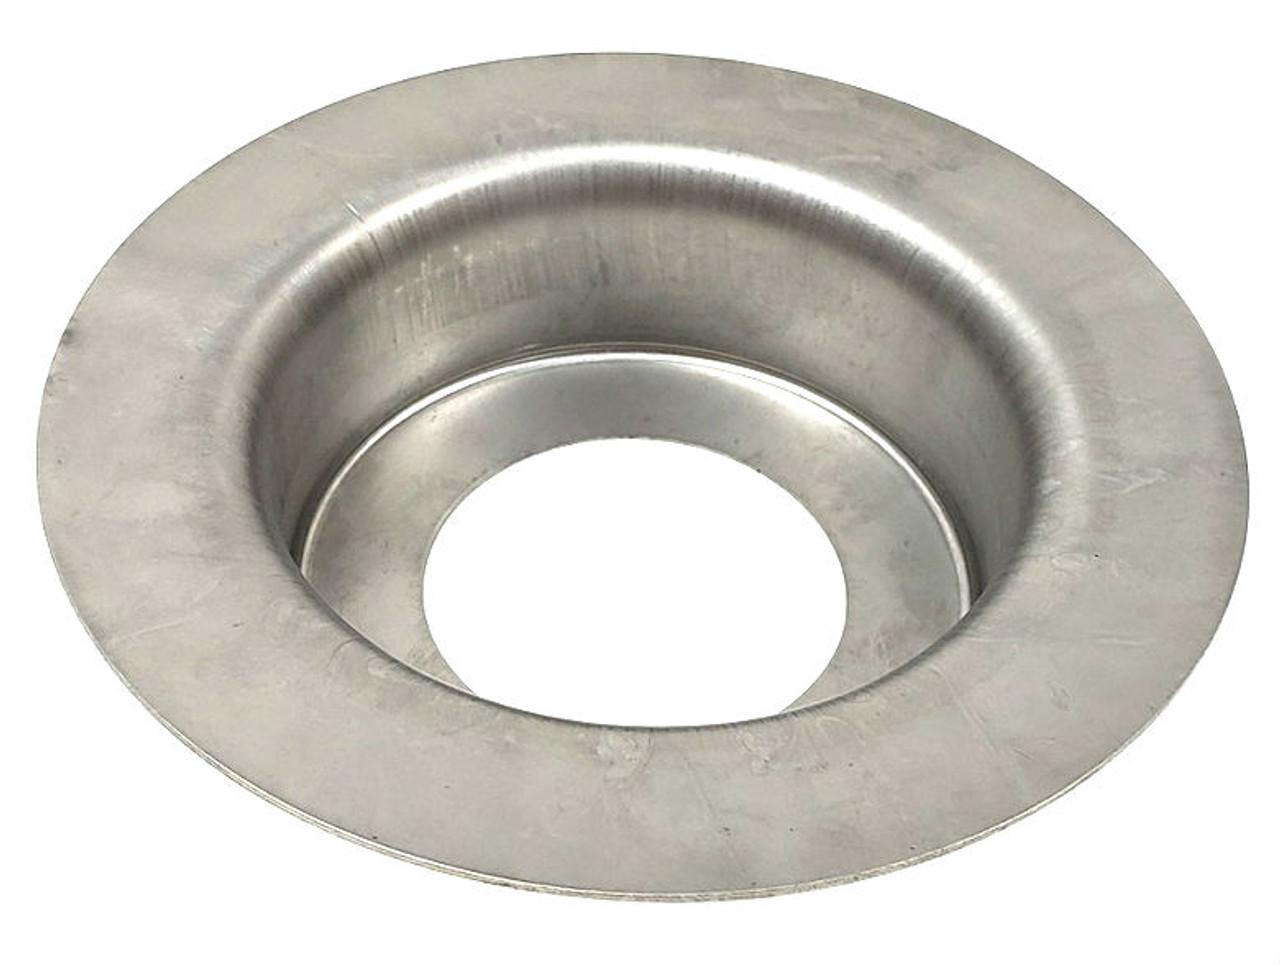 Chrome Stainless Steel Flush Mount Fuel Fill Filler Neck Cap truck bed deck gas